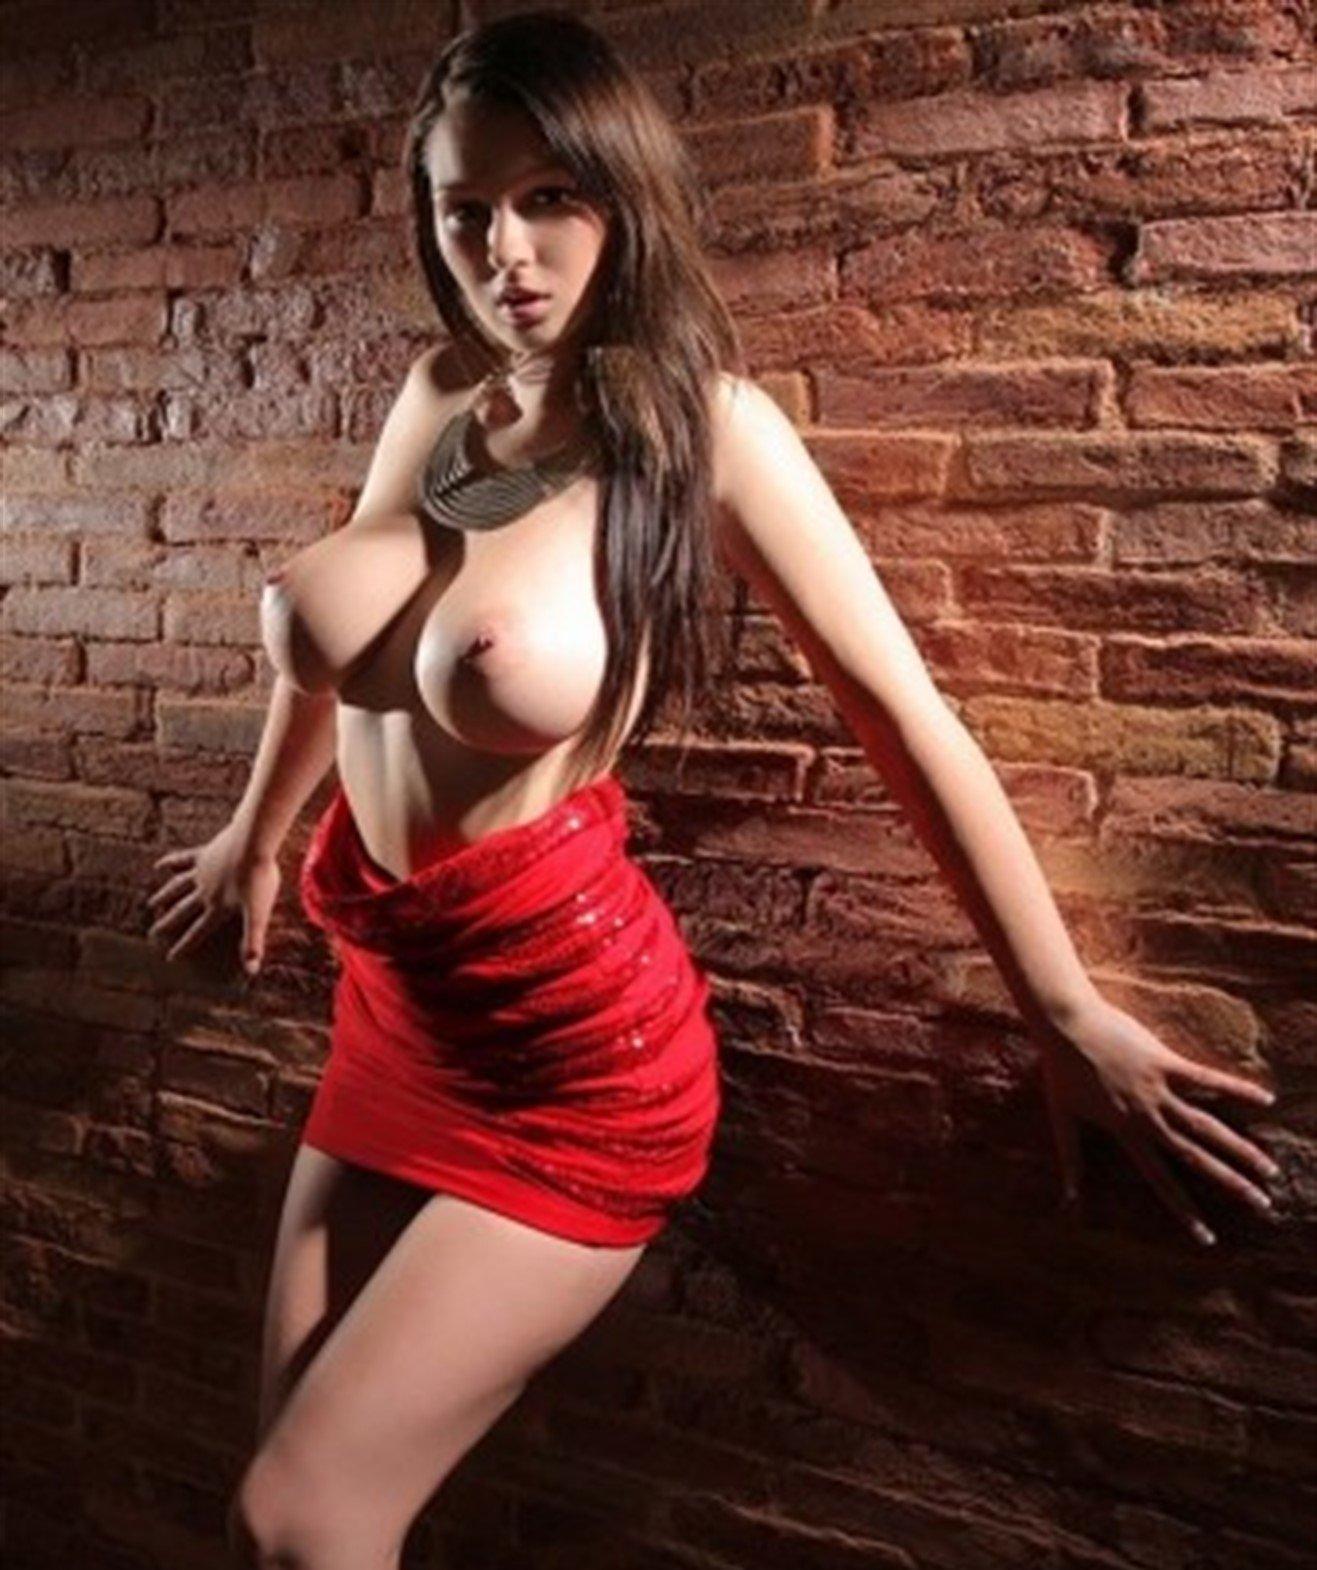 Проститутки Индивидуалки Таганрог